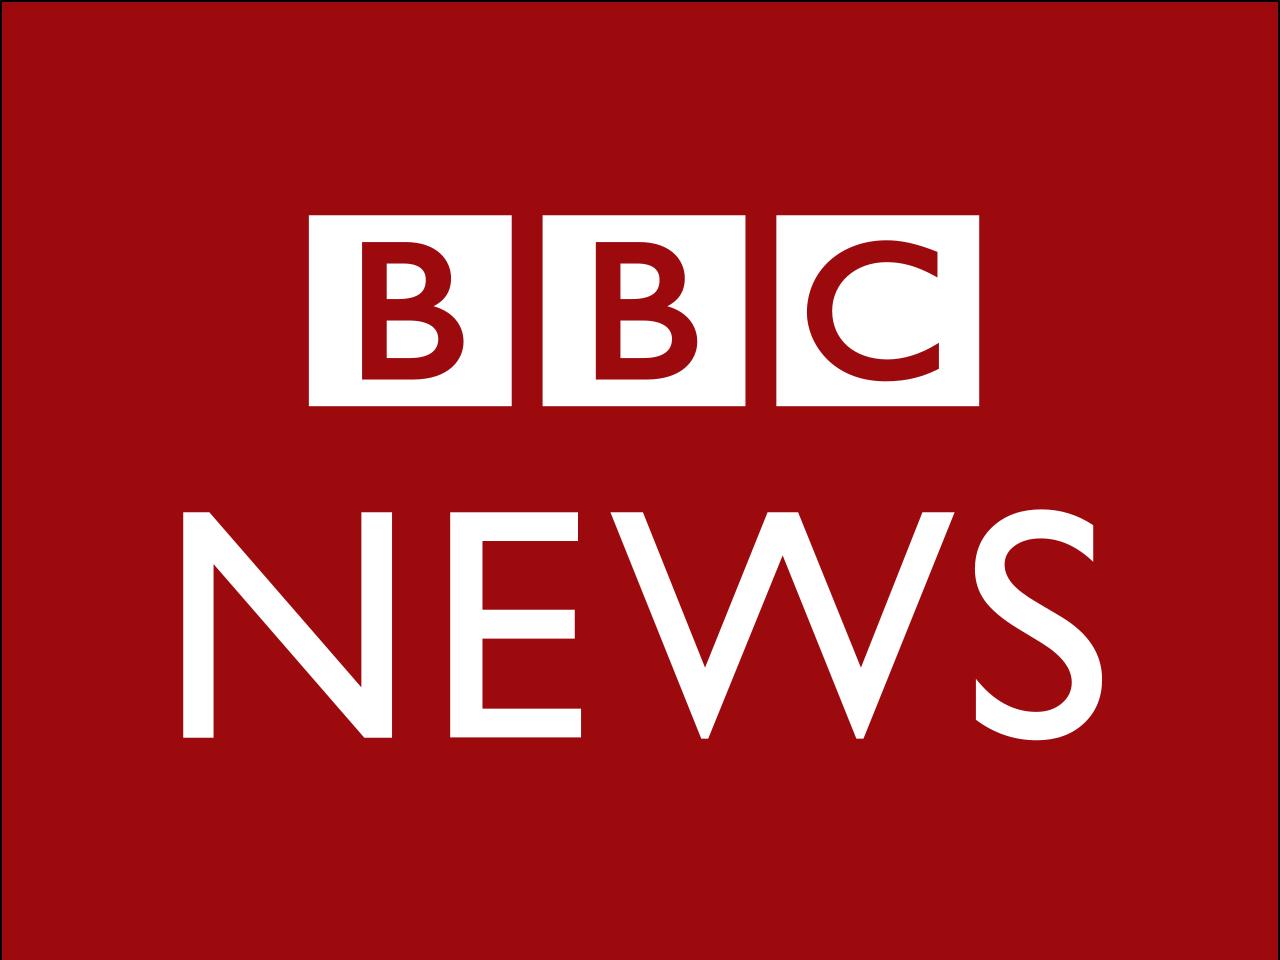 BBC cuts 450 newsroom jobs, shifts attention to digital platforms